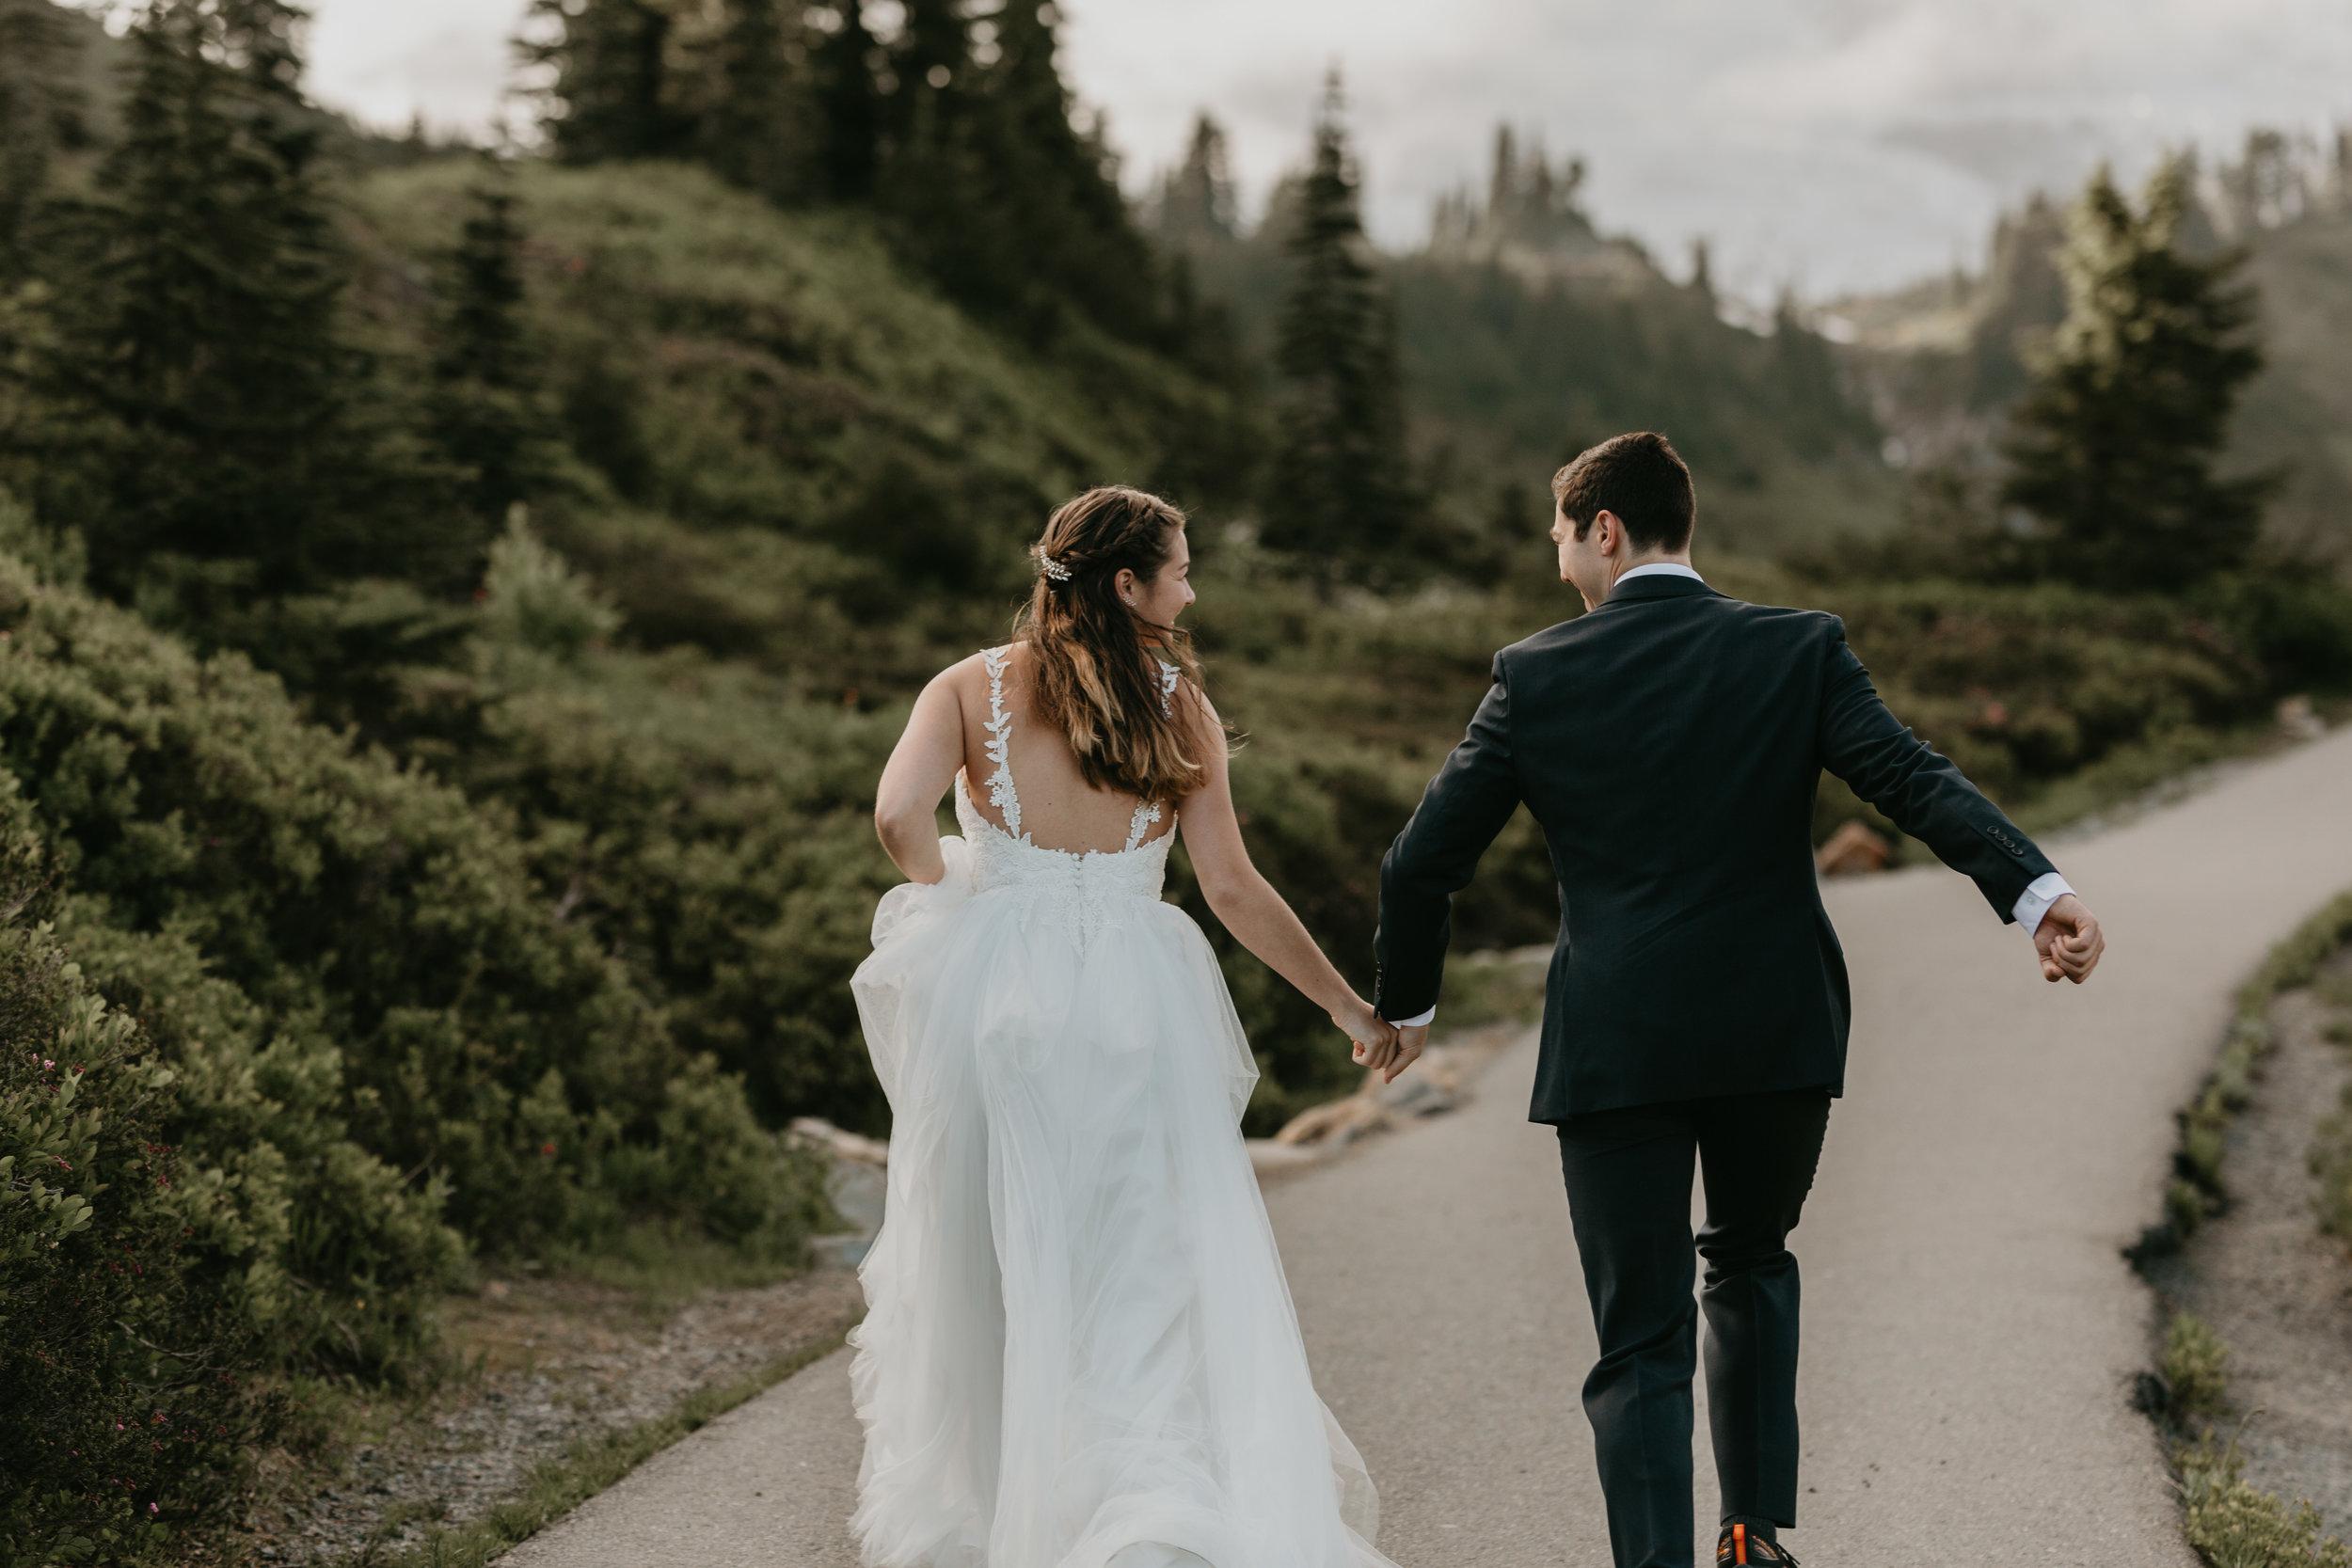 Nicole-Daacke-Photography-Mt-Rainier-elopement-photographer-washington-mountain-epic-wedding-photography-wildflowers-at-rainier-pine-tree-cloudy-summer-day-at-mountain-rainier-6.jpg